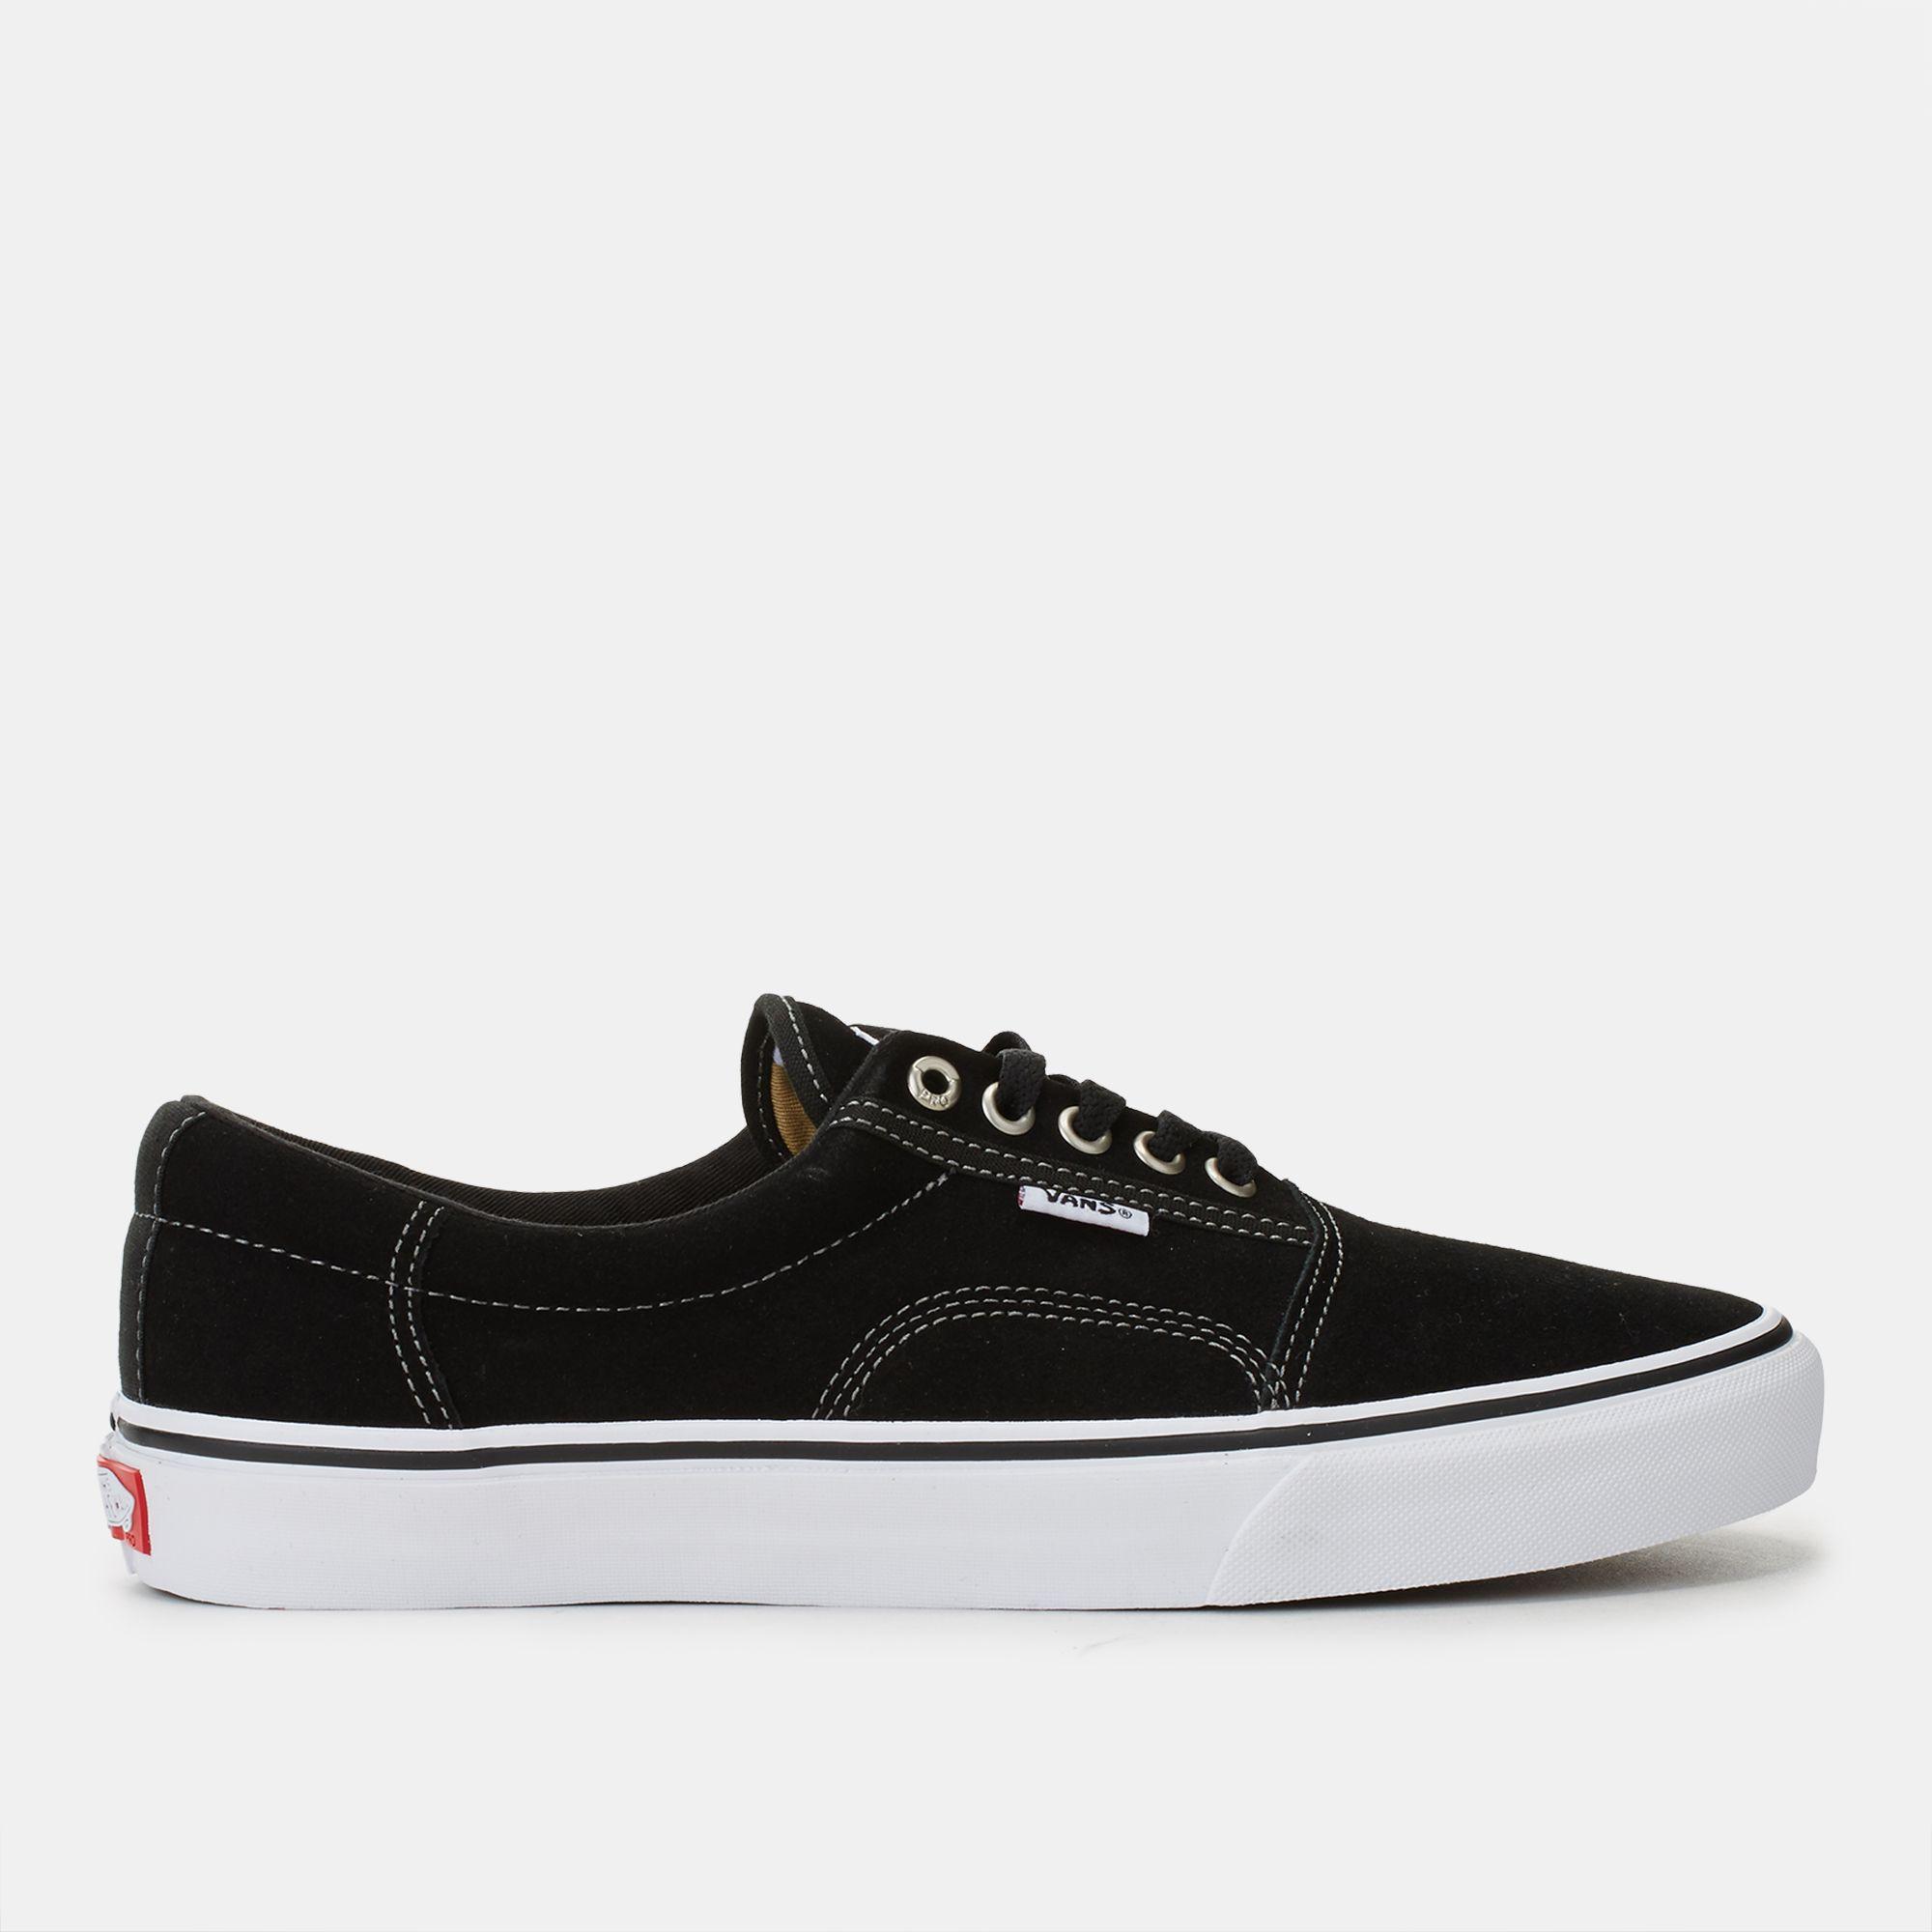 c594f4770cfb88 Shop Black Vans Rowley Solo Skate Shoe for Mens by Vans